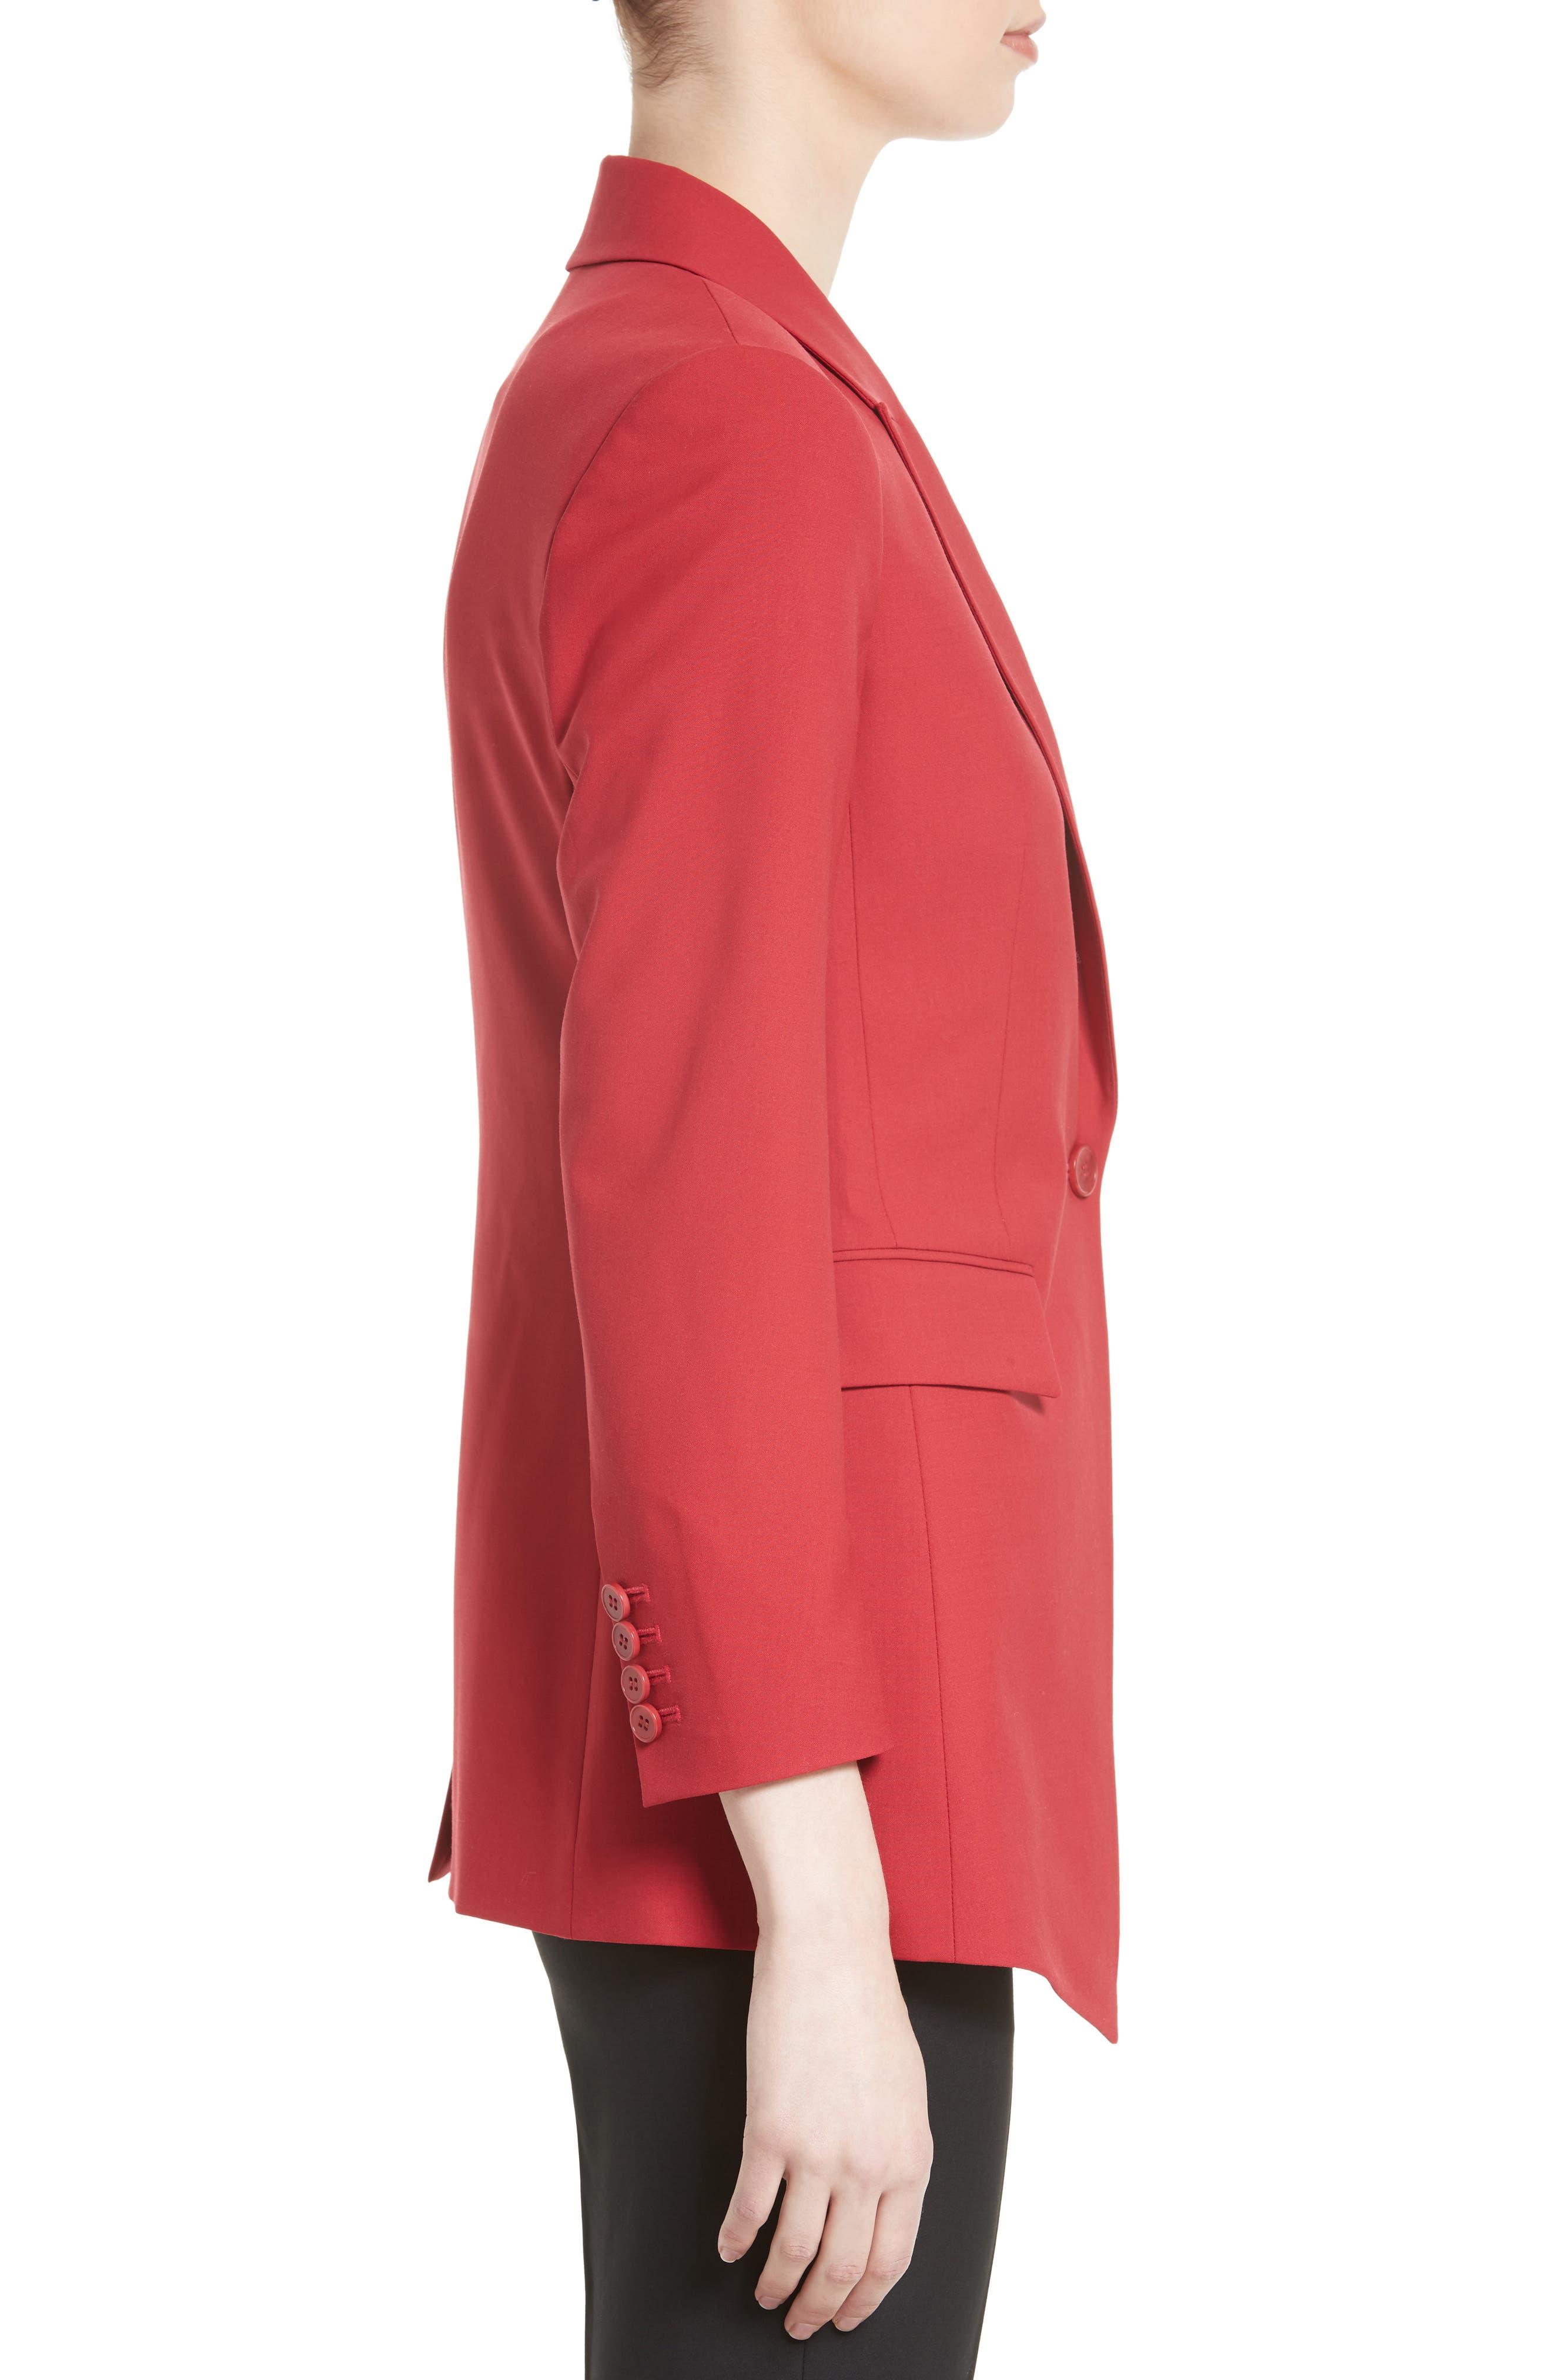 Etienette B Good Wool Suit Jacket,                             Alternate thumbnail 24, color,